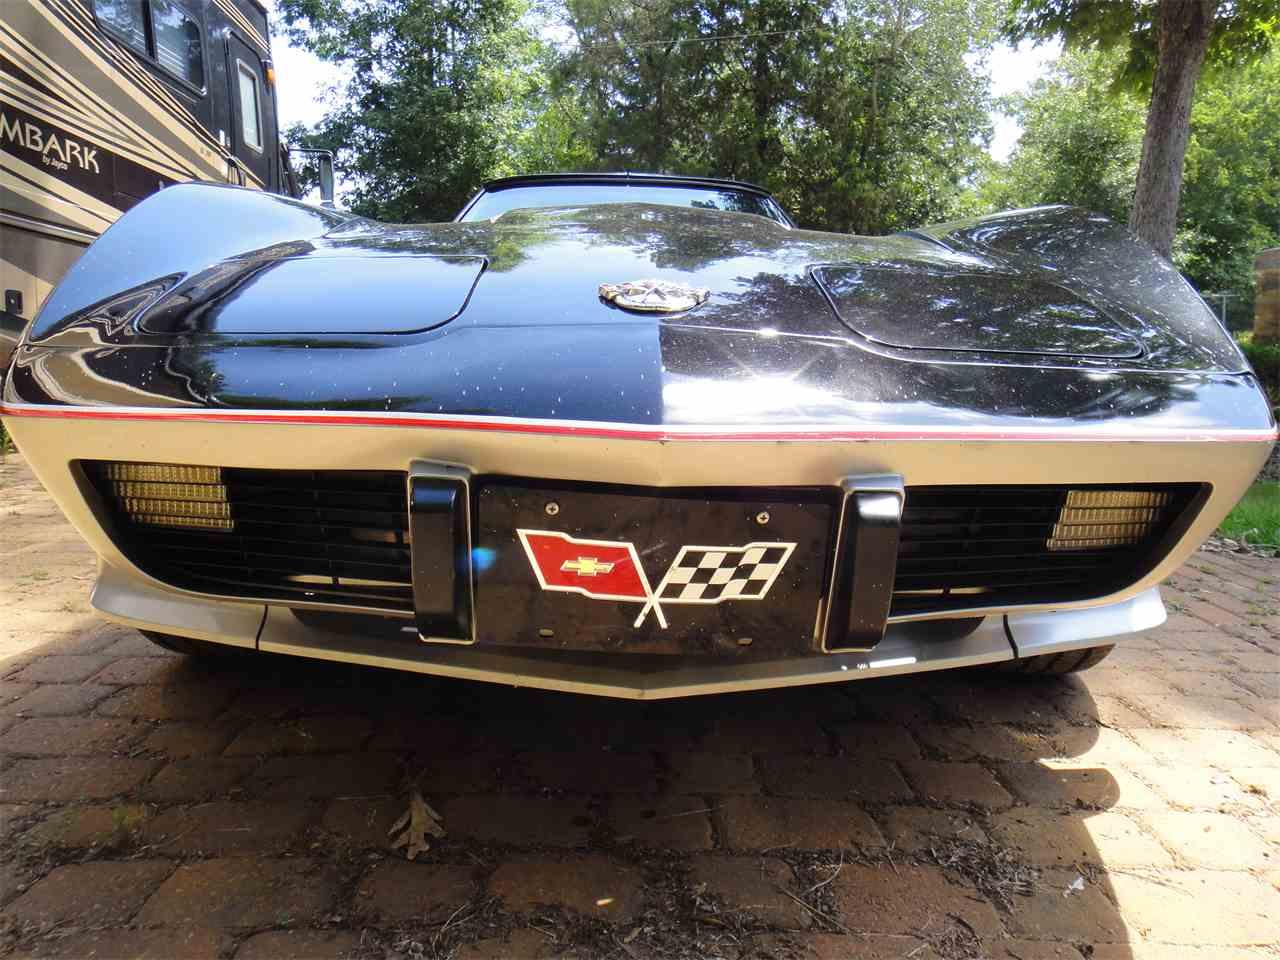 1978 Chevrolet Corvette for Sale | ClassicCars.com | CC-1023286